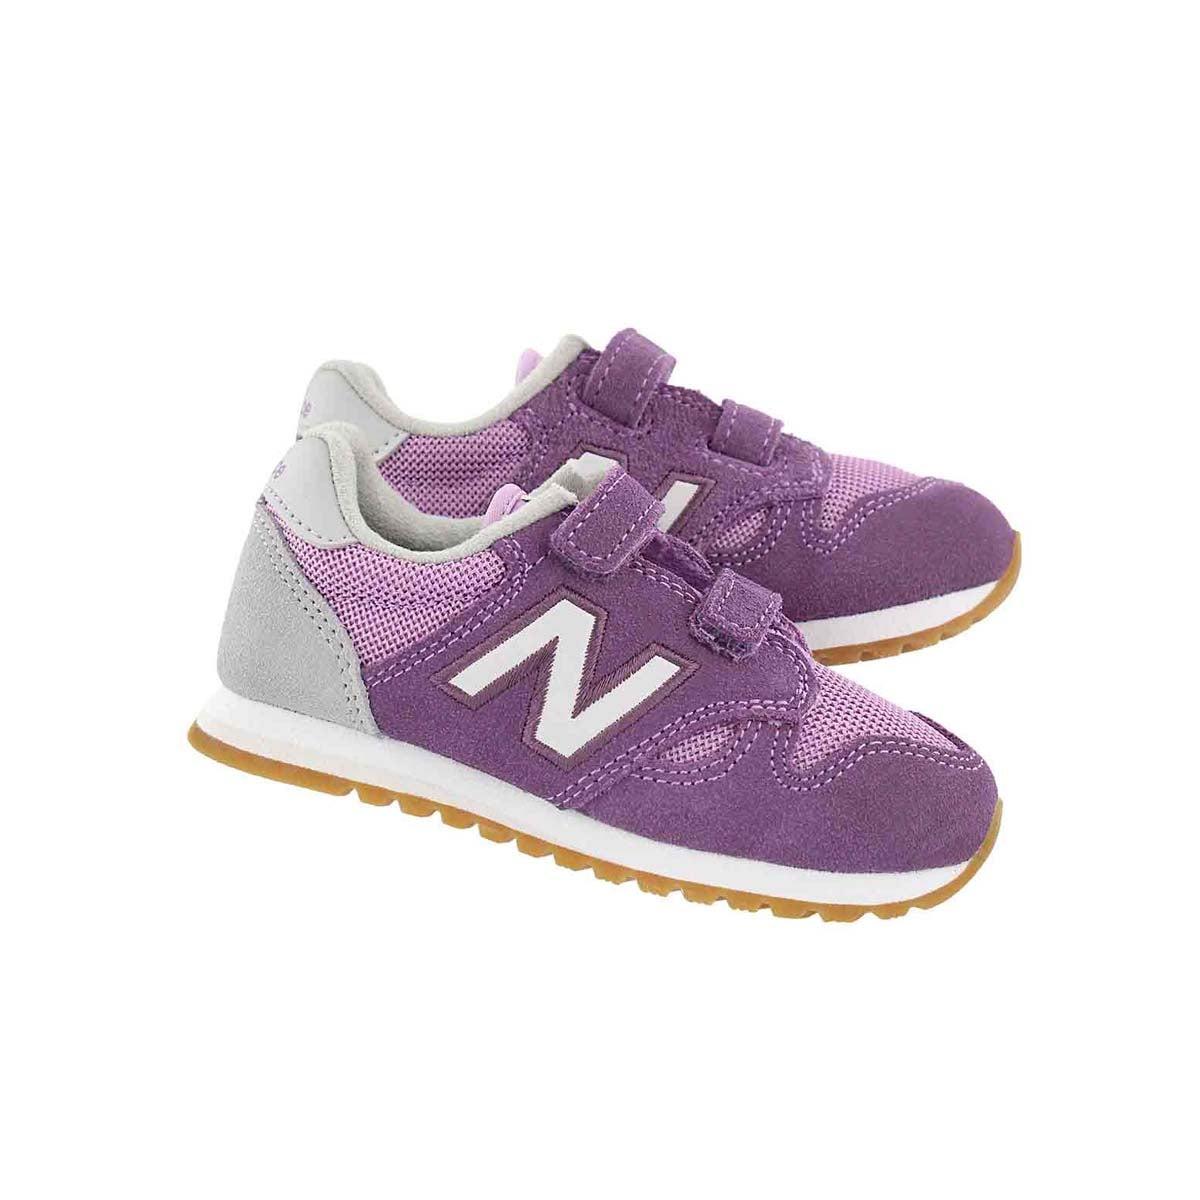 Infs-g 520 purple/white sneaker